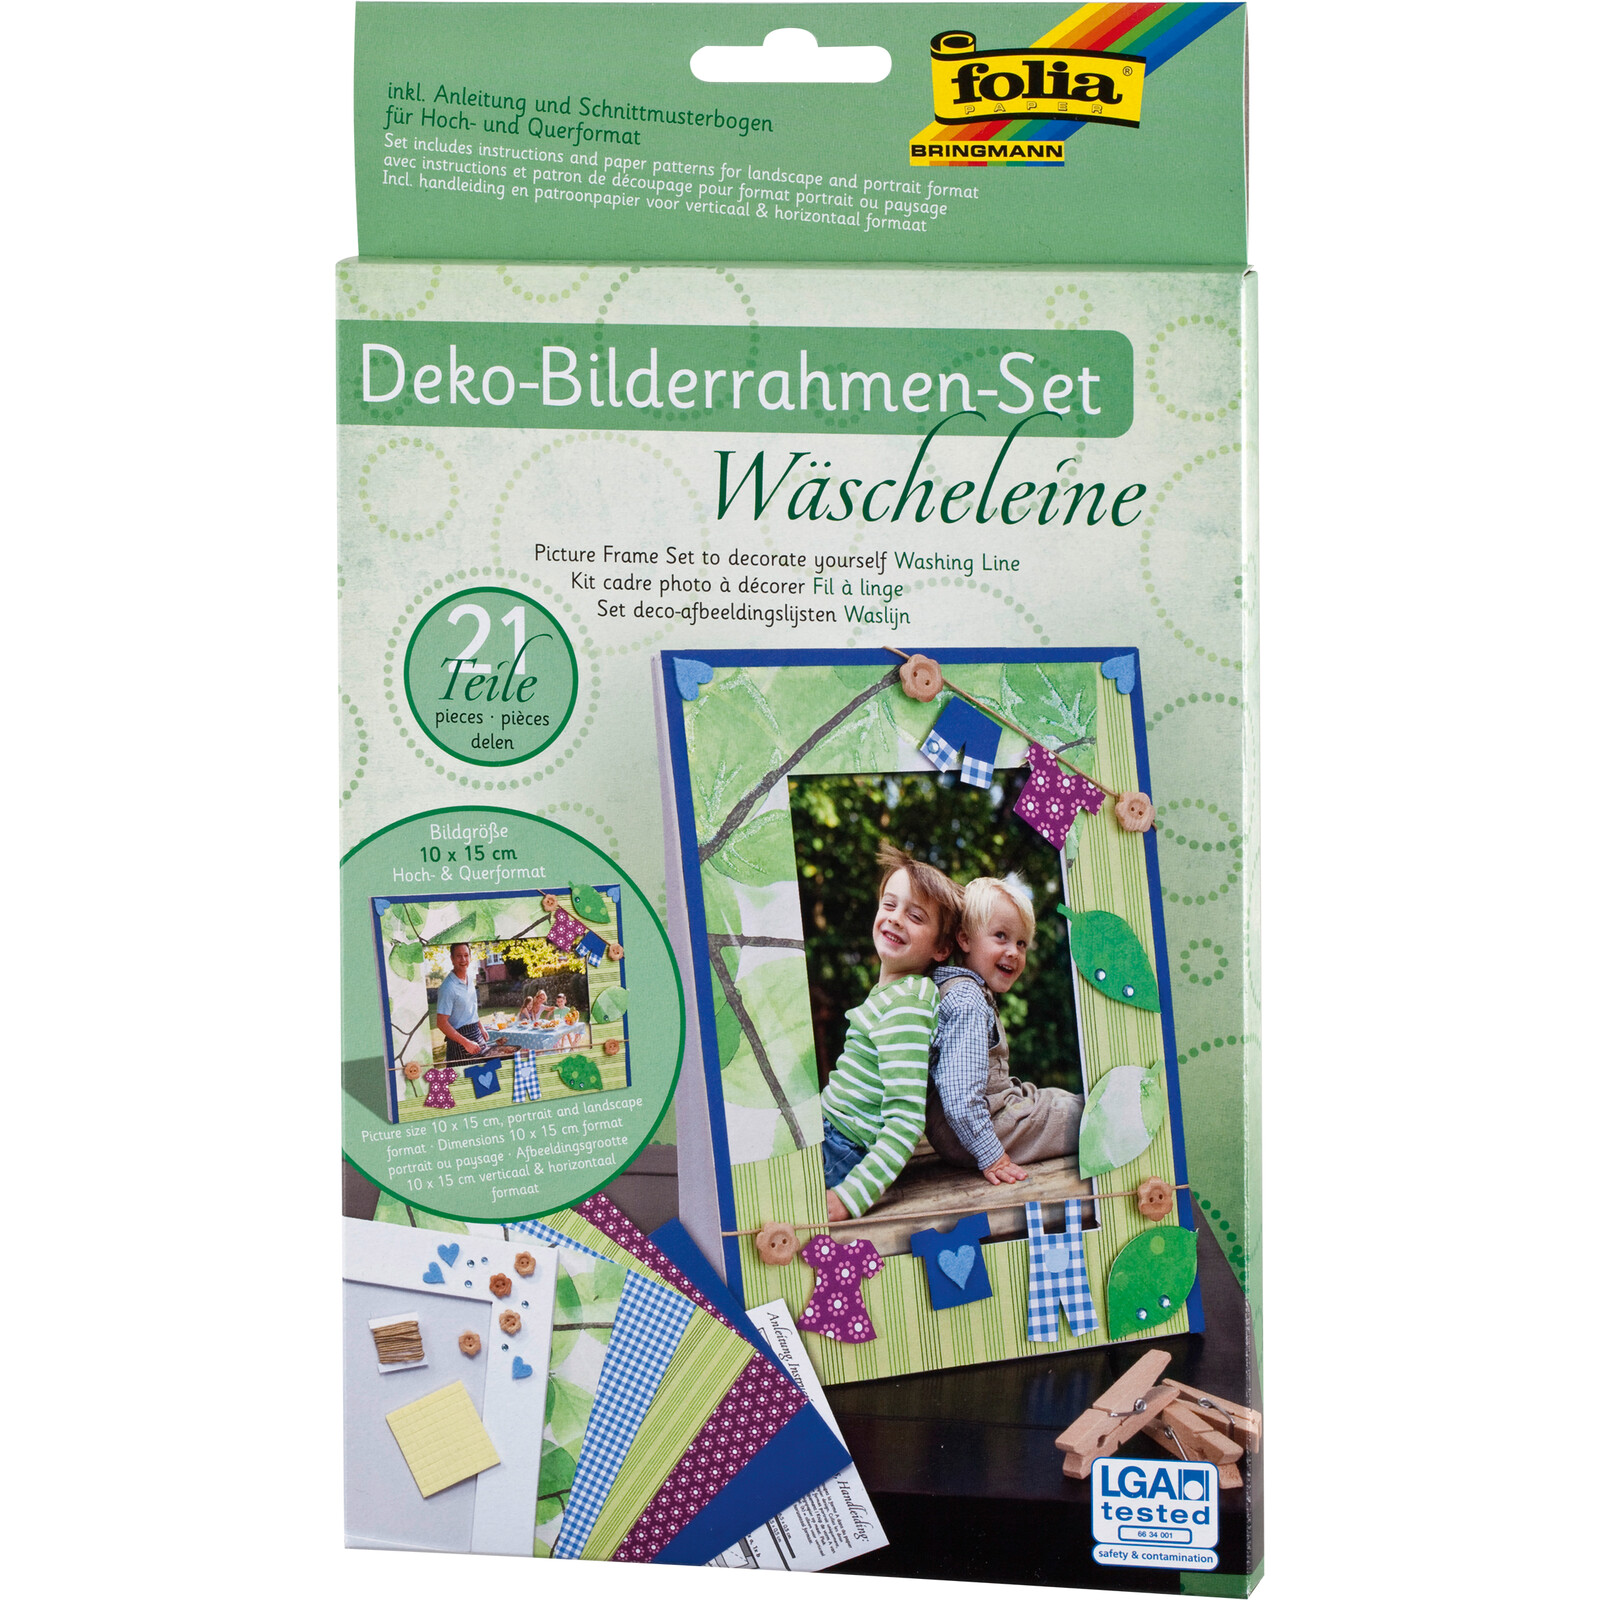 Folia Bilderrahmen-Set Wäscheleine